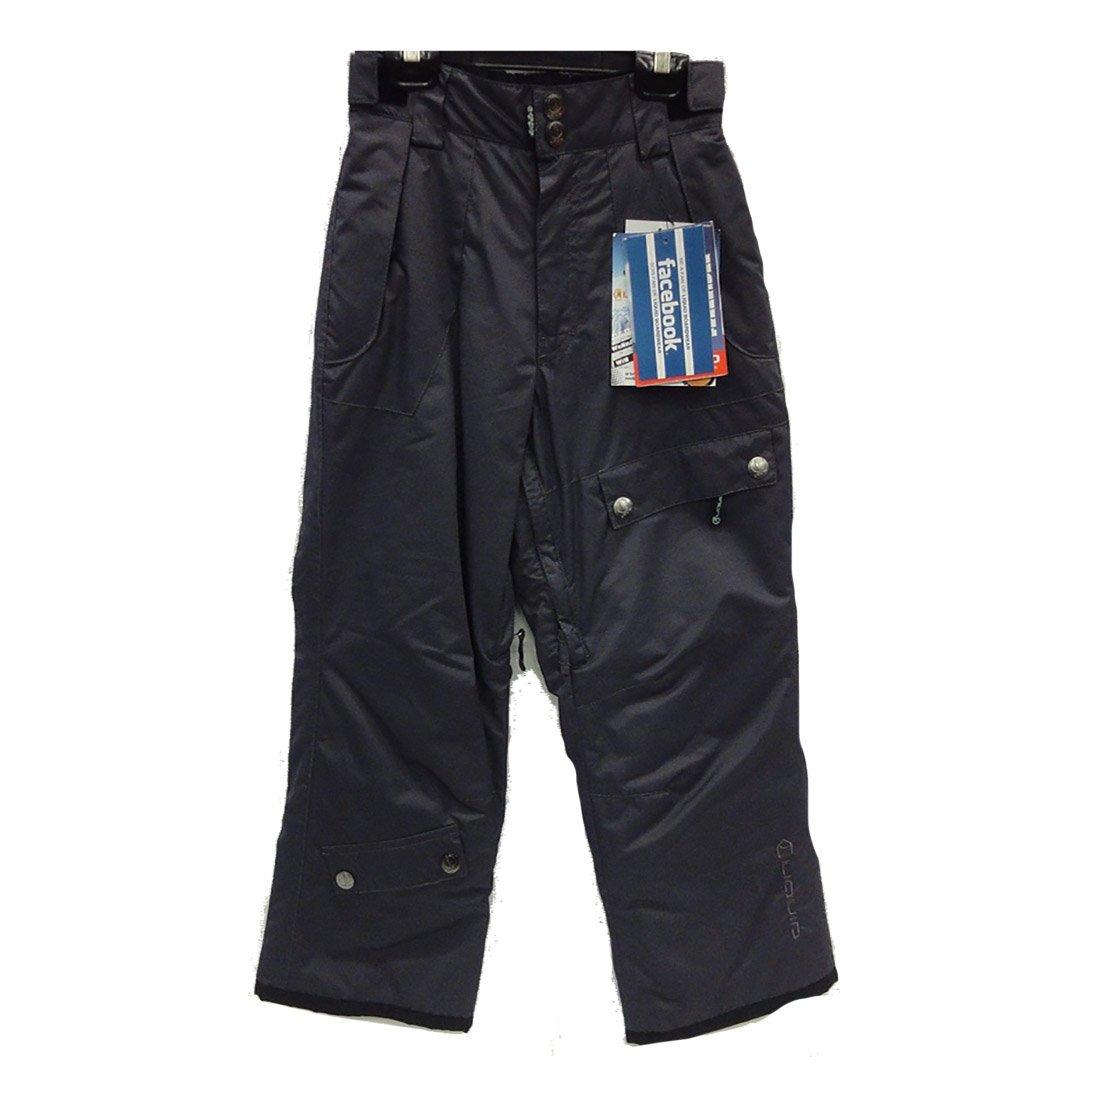 Liquid Boardwear Boys Shermy Pant Size Small Charcoal